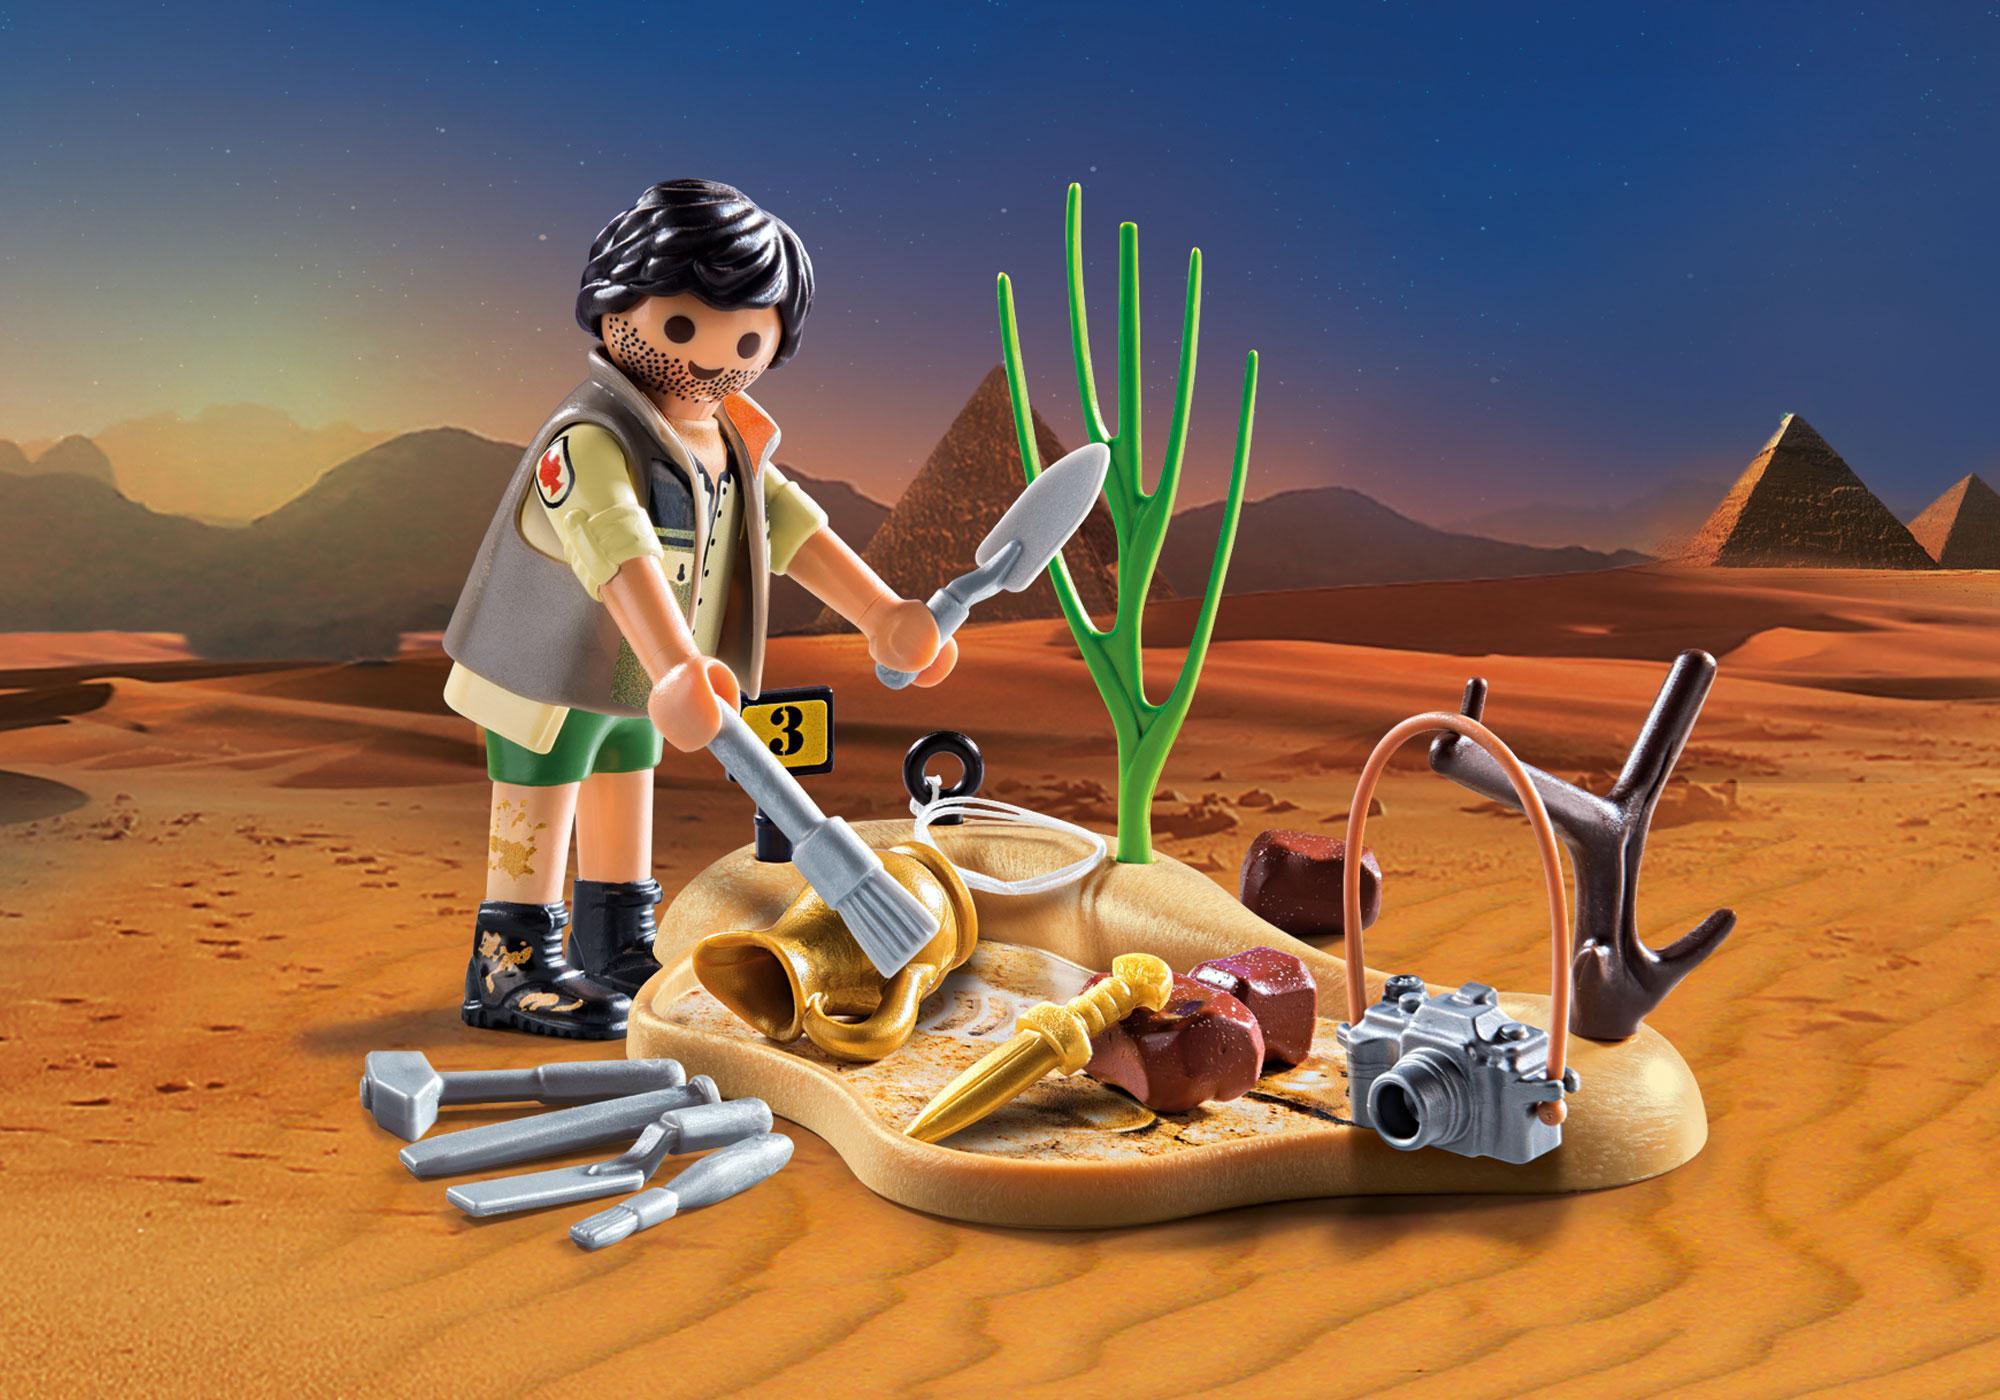 9359_product_detail/Αρχαιολόγος με εργαλεία ανασκαφής